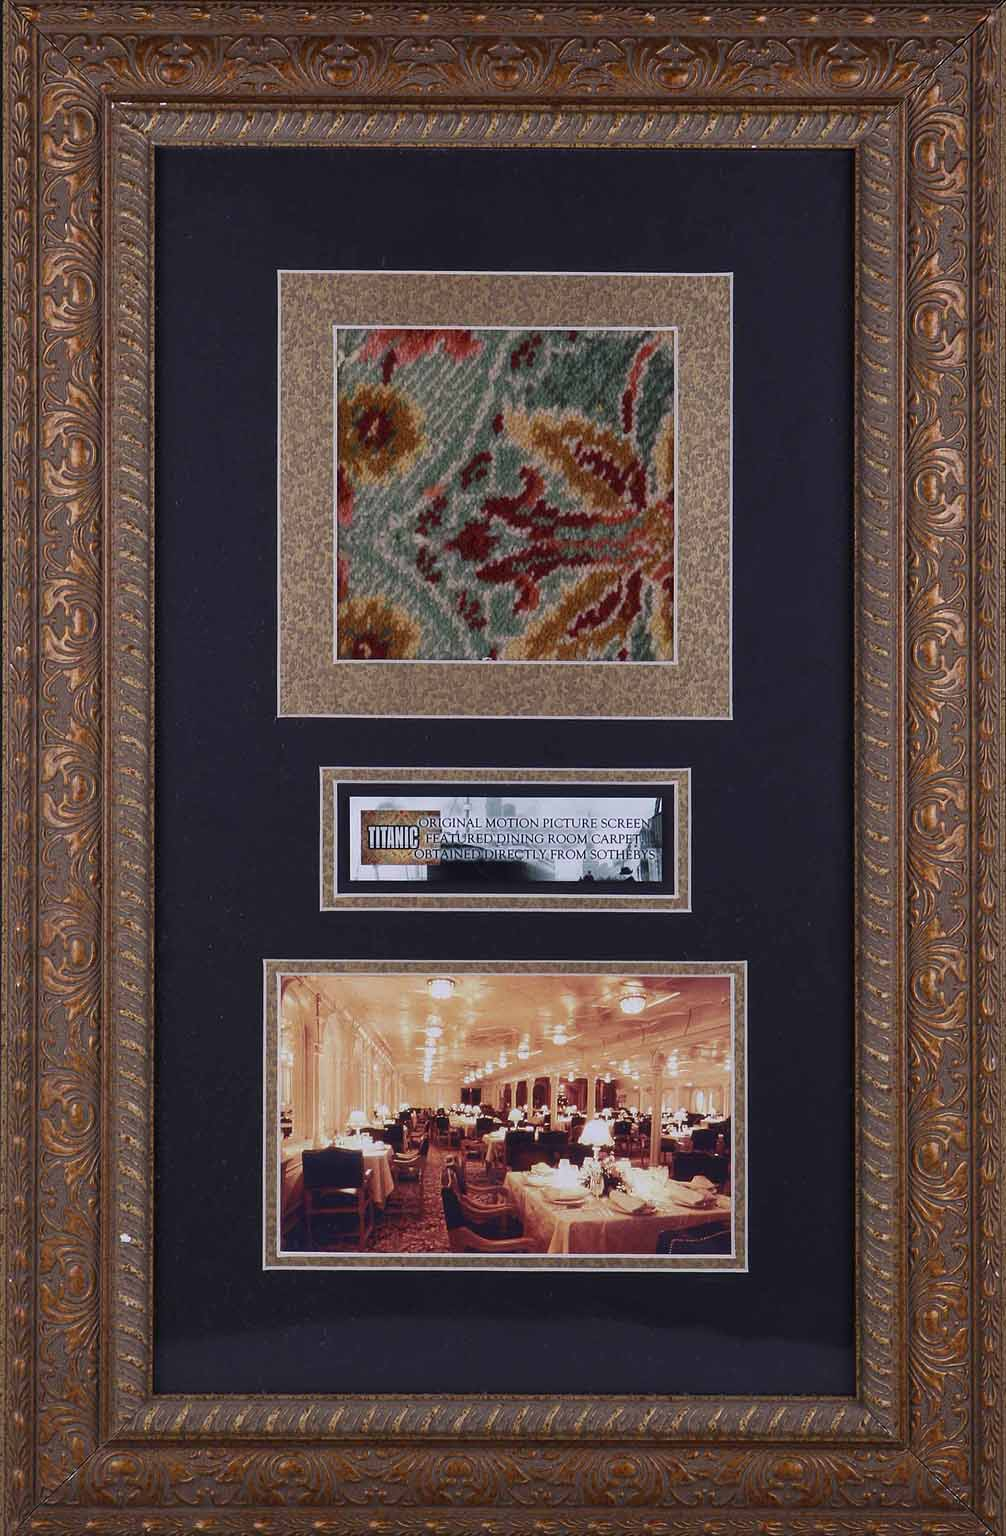 Titanic Film Memorabilia A Piece Of Carpet From The Screen Dining